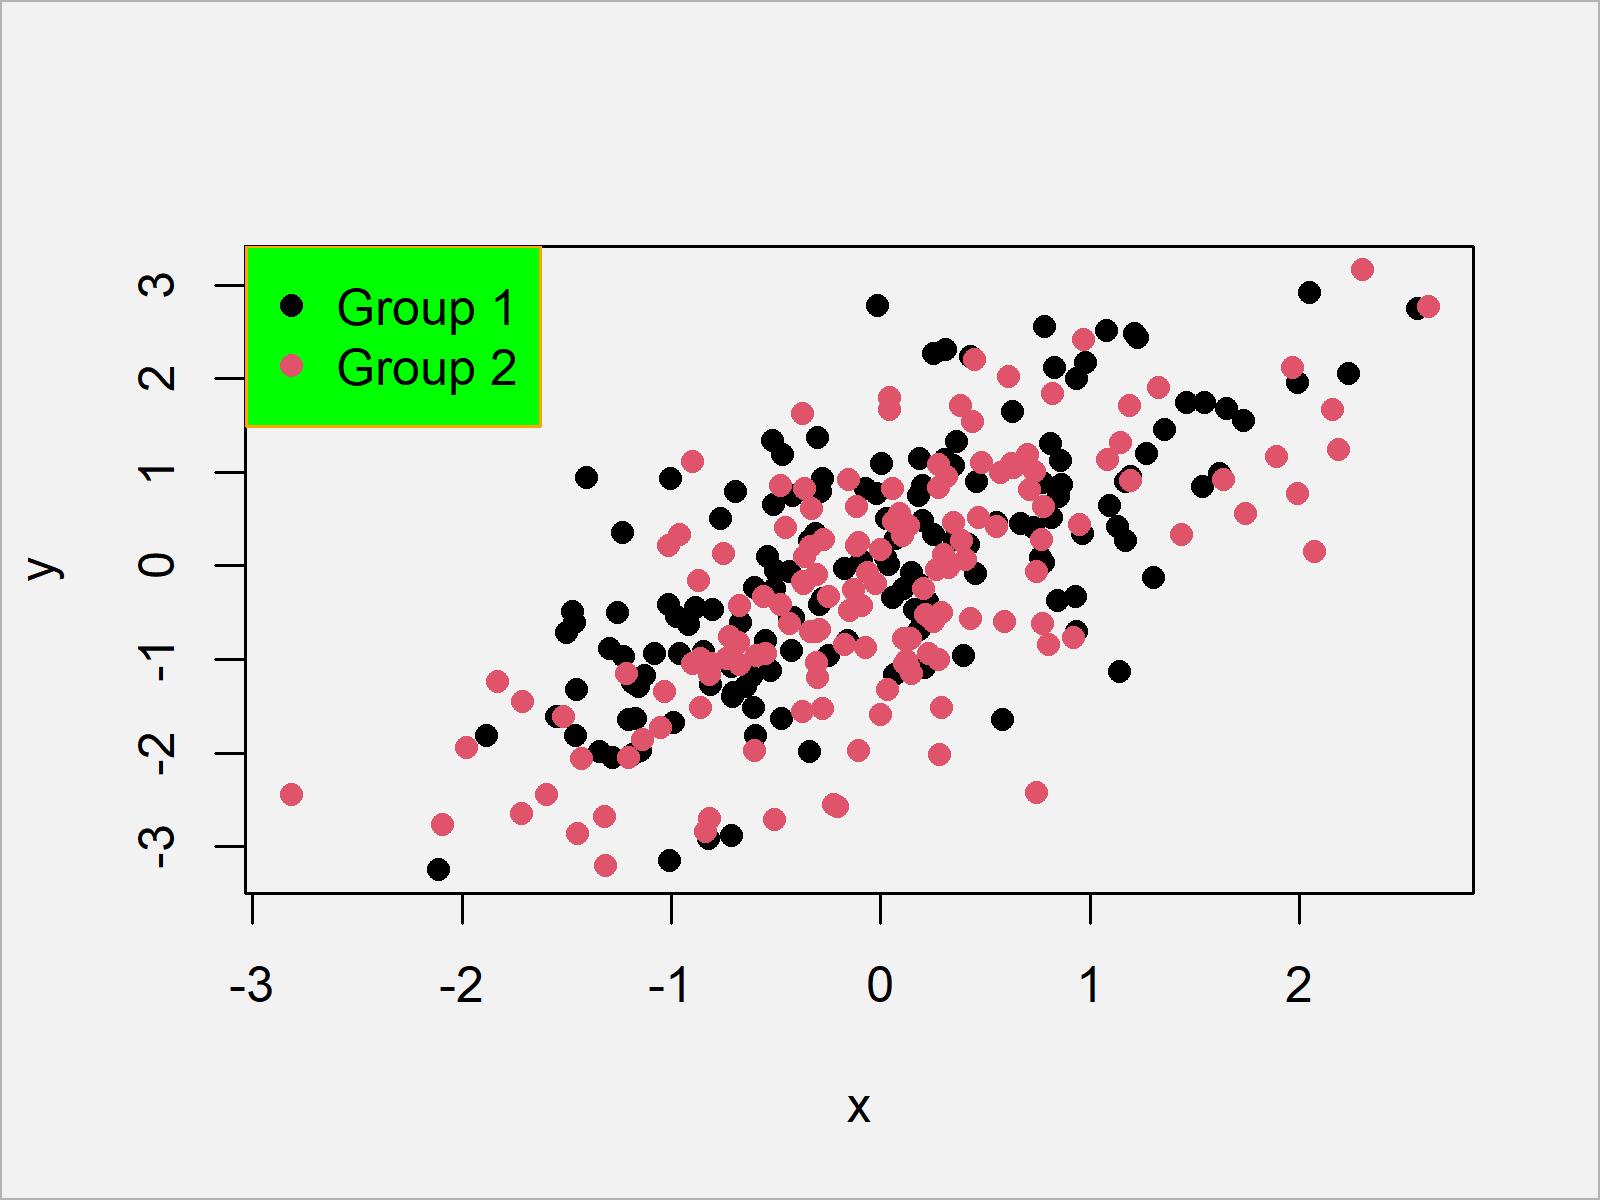 r graph figure 5 add legend base